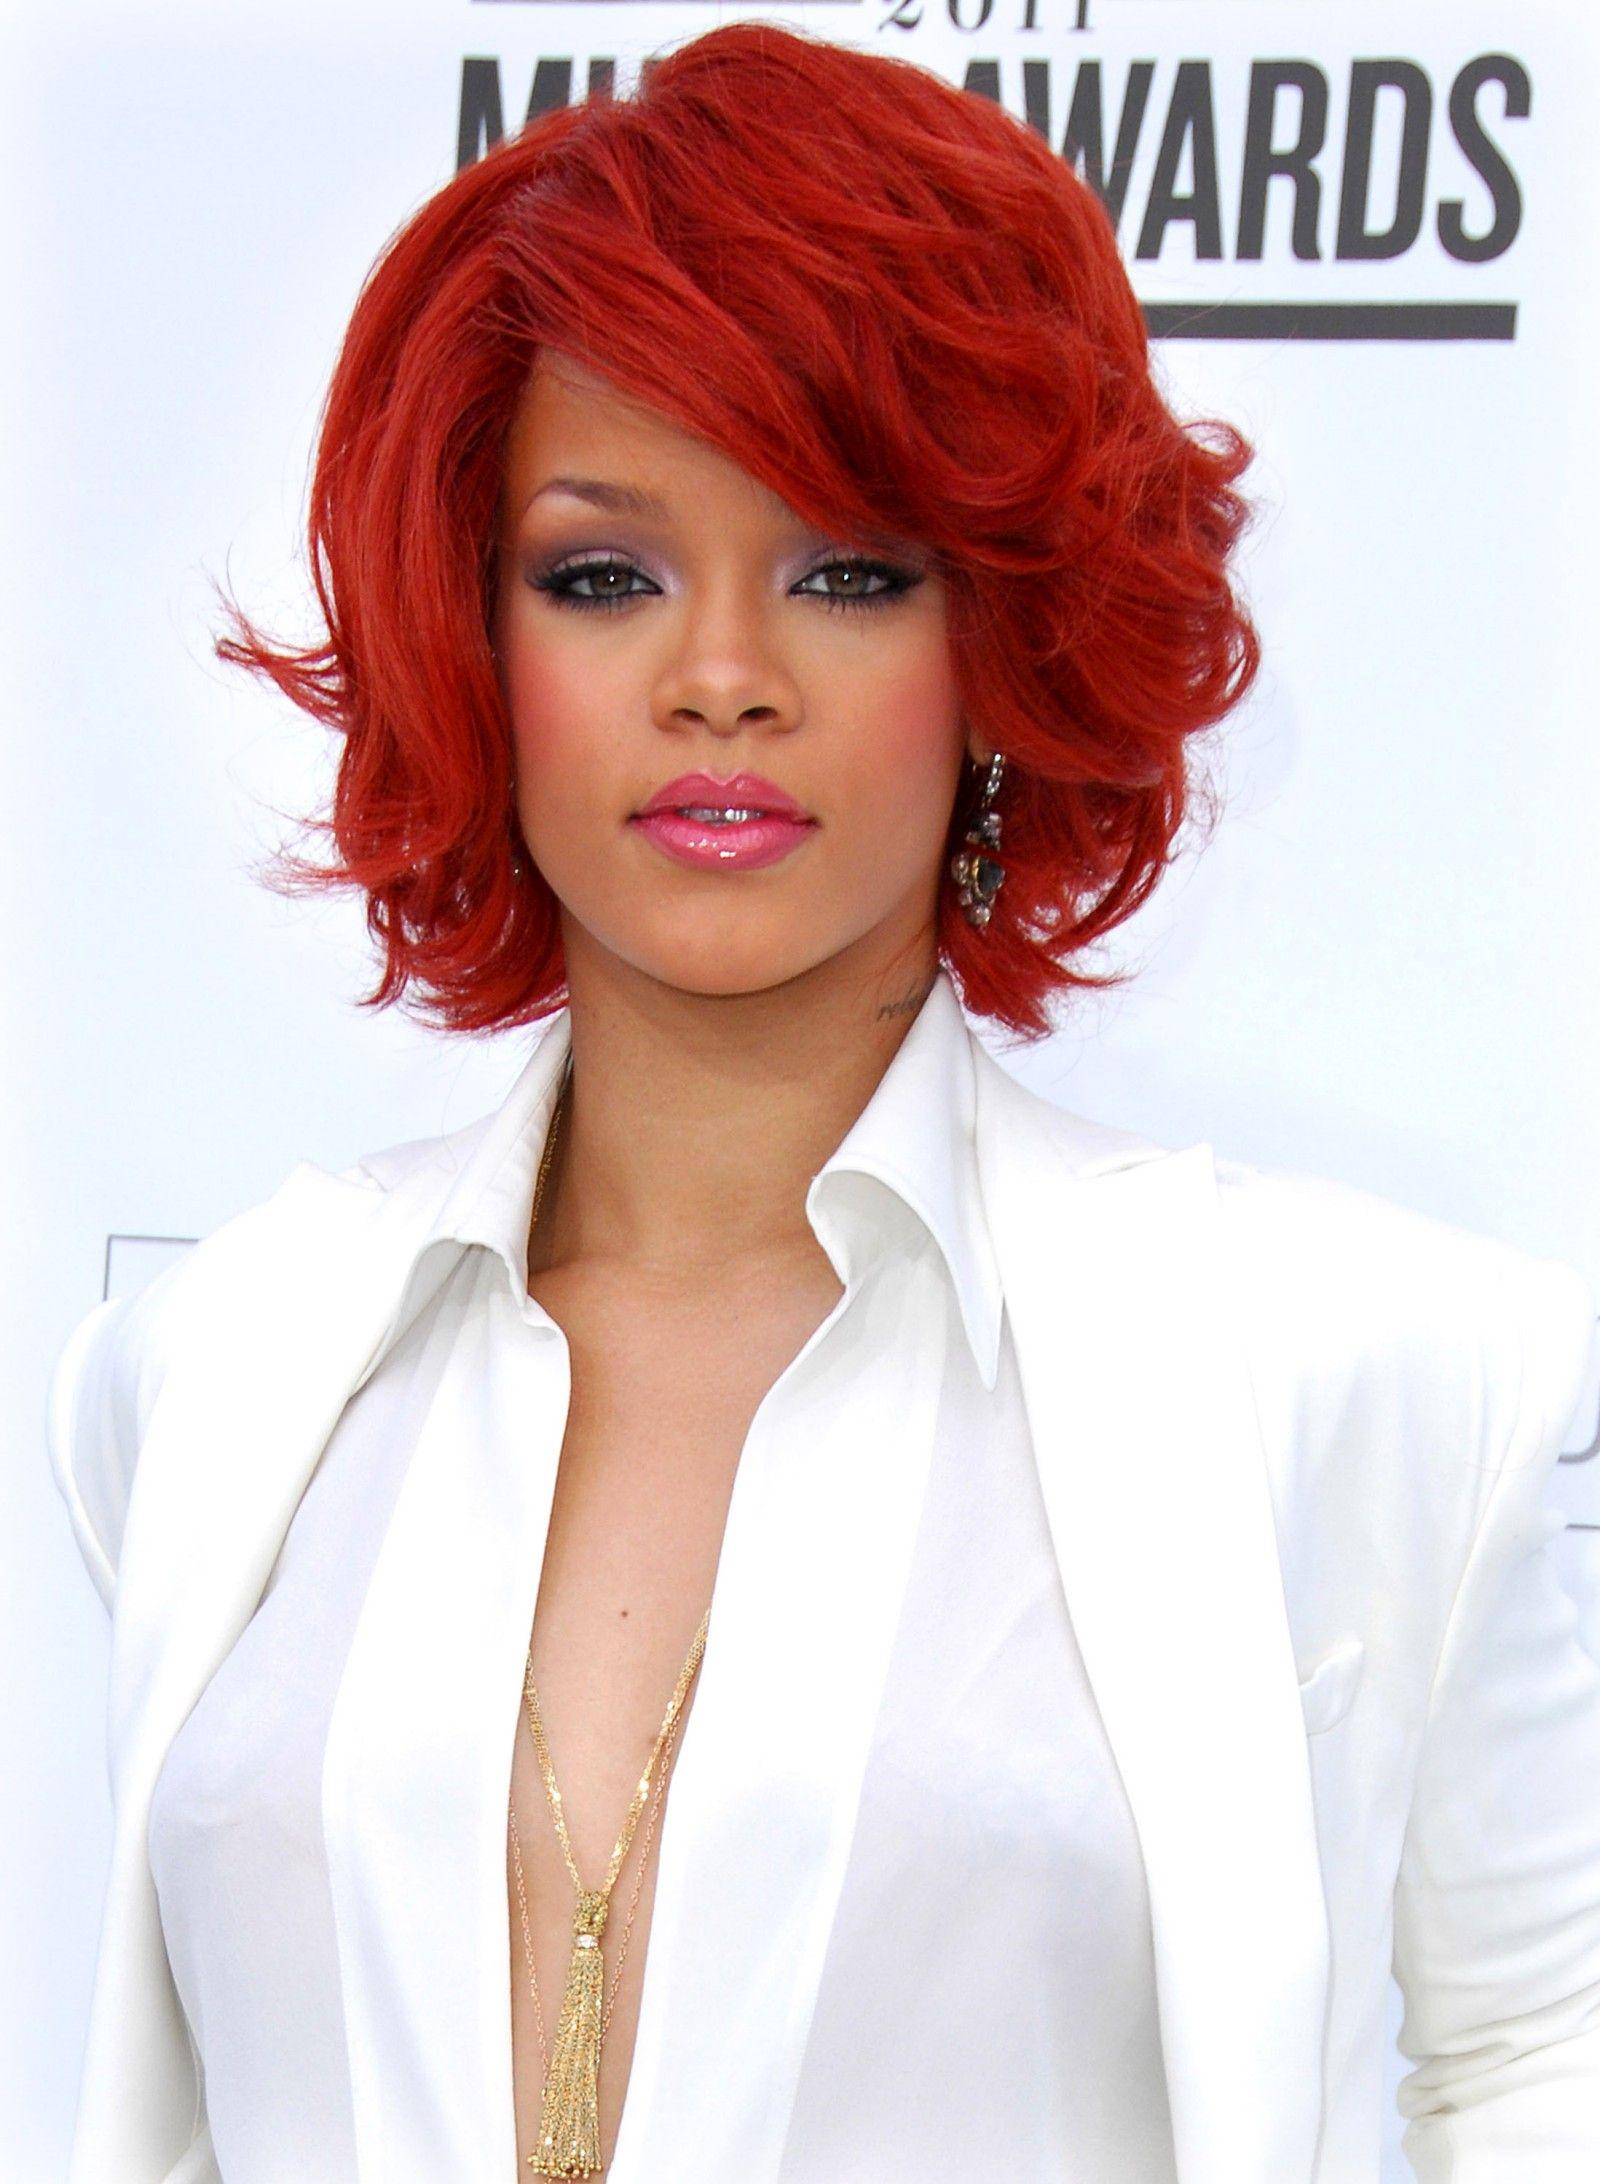 rihanna. red hair love. | Rihanna hairstyles, Rihanna red